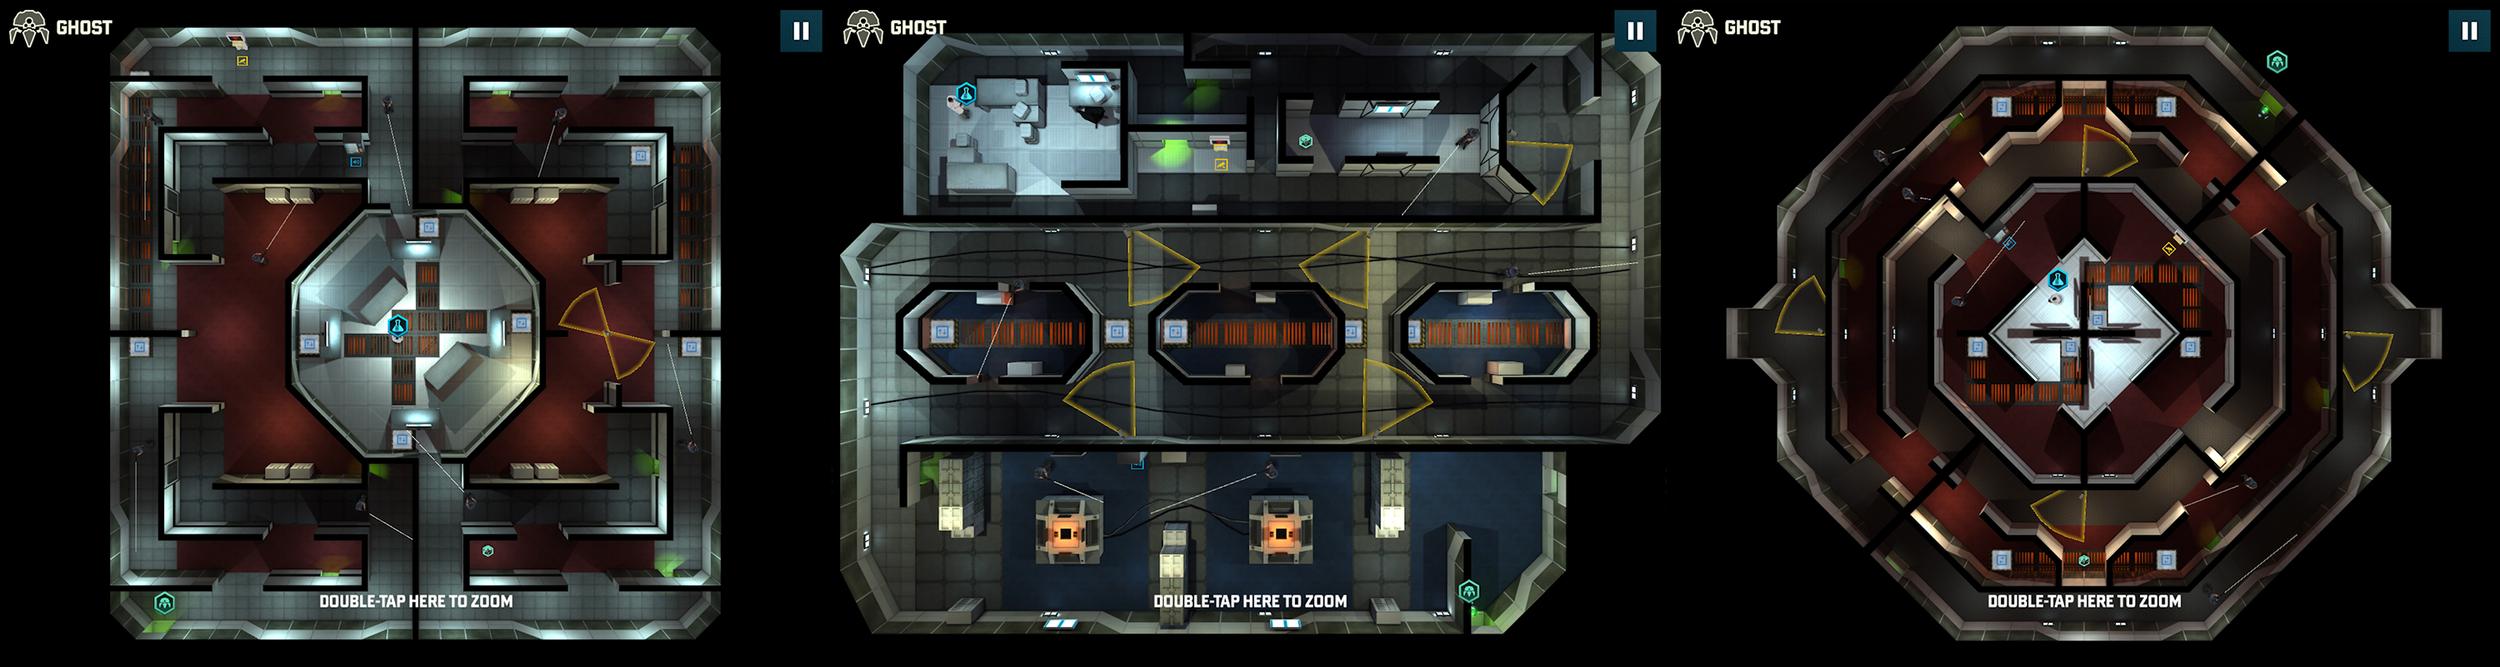 spider-bot-levels-03.png